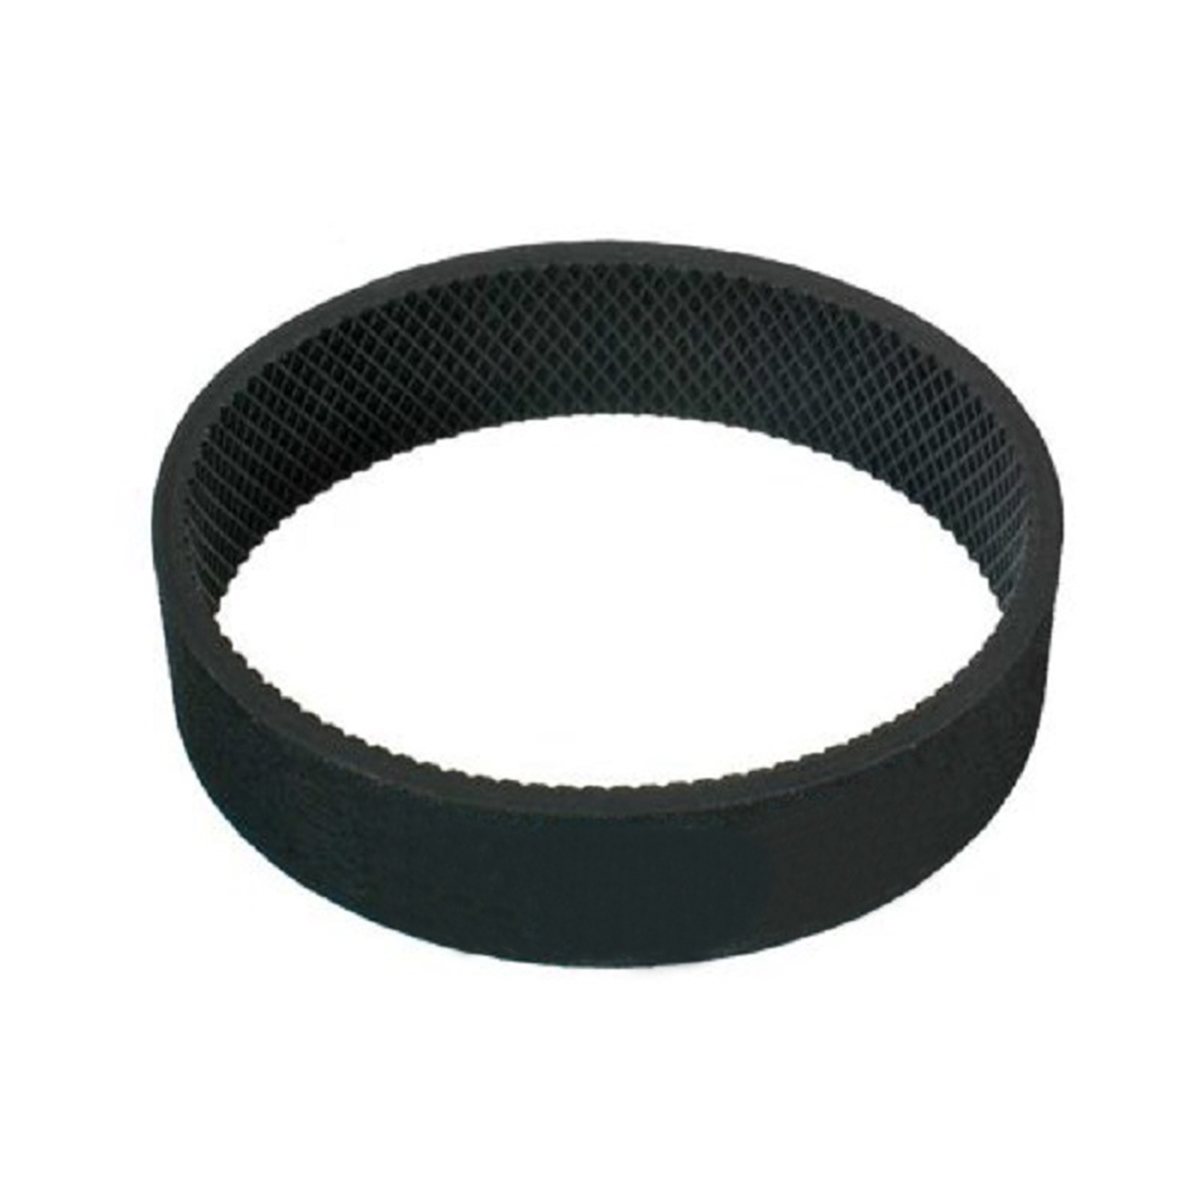 5pcs Black Rubber Vacuum Belt For /Kirby 301291 Vacuum Cleaner and Shampooer Belt Stripe Vacuum Cleaner Home Appliance